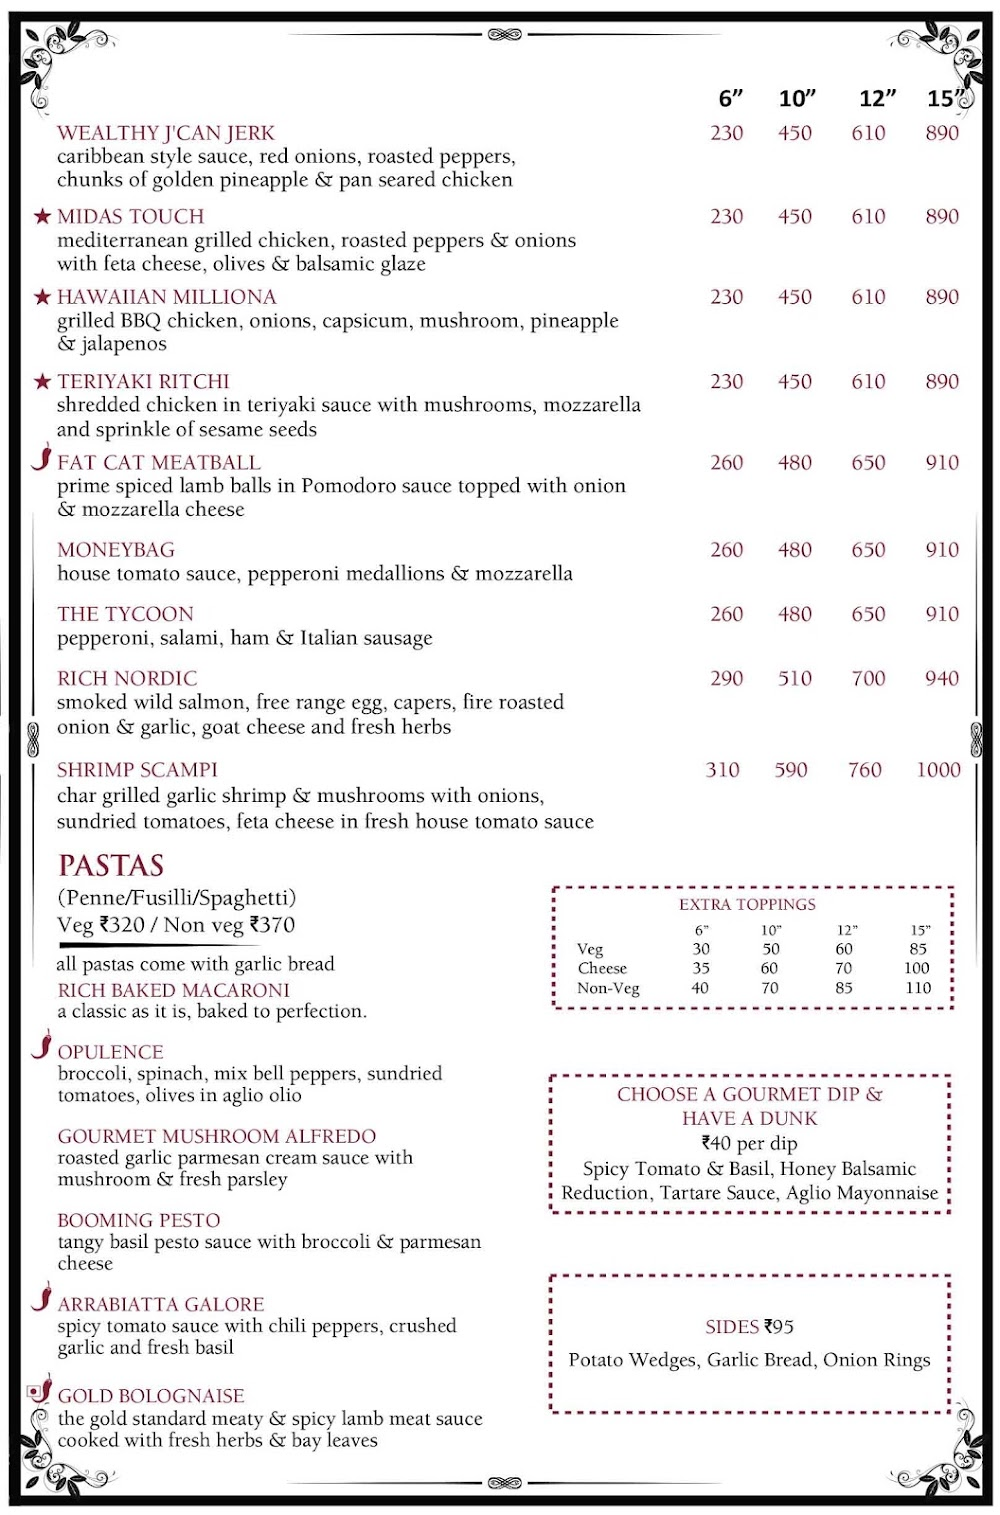 The Millionaire Pizza & Pasta menu 3